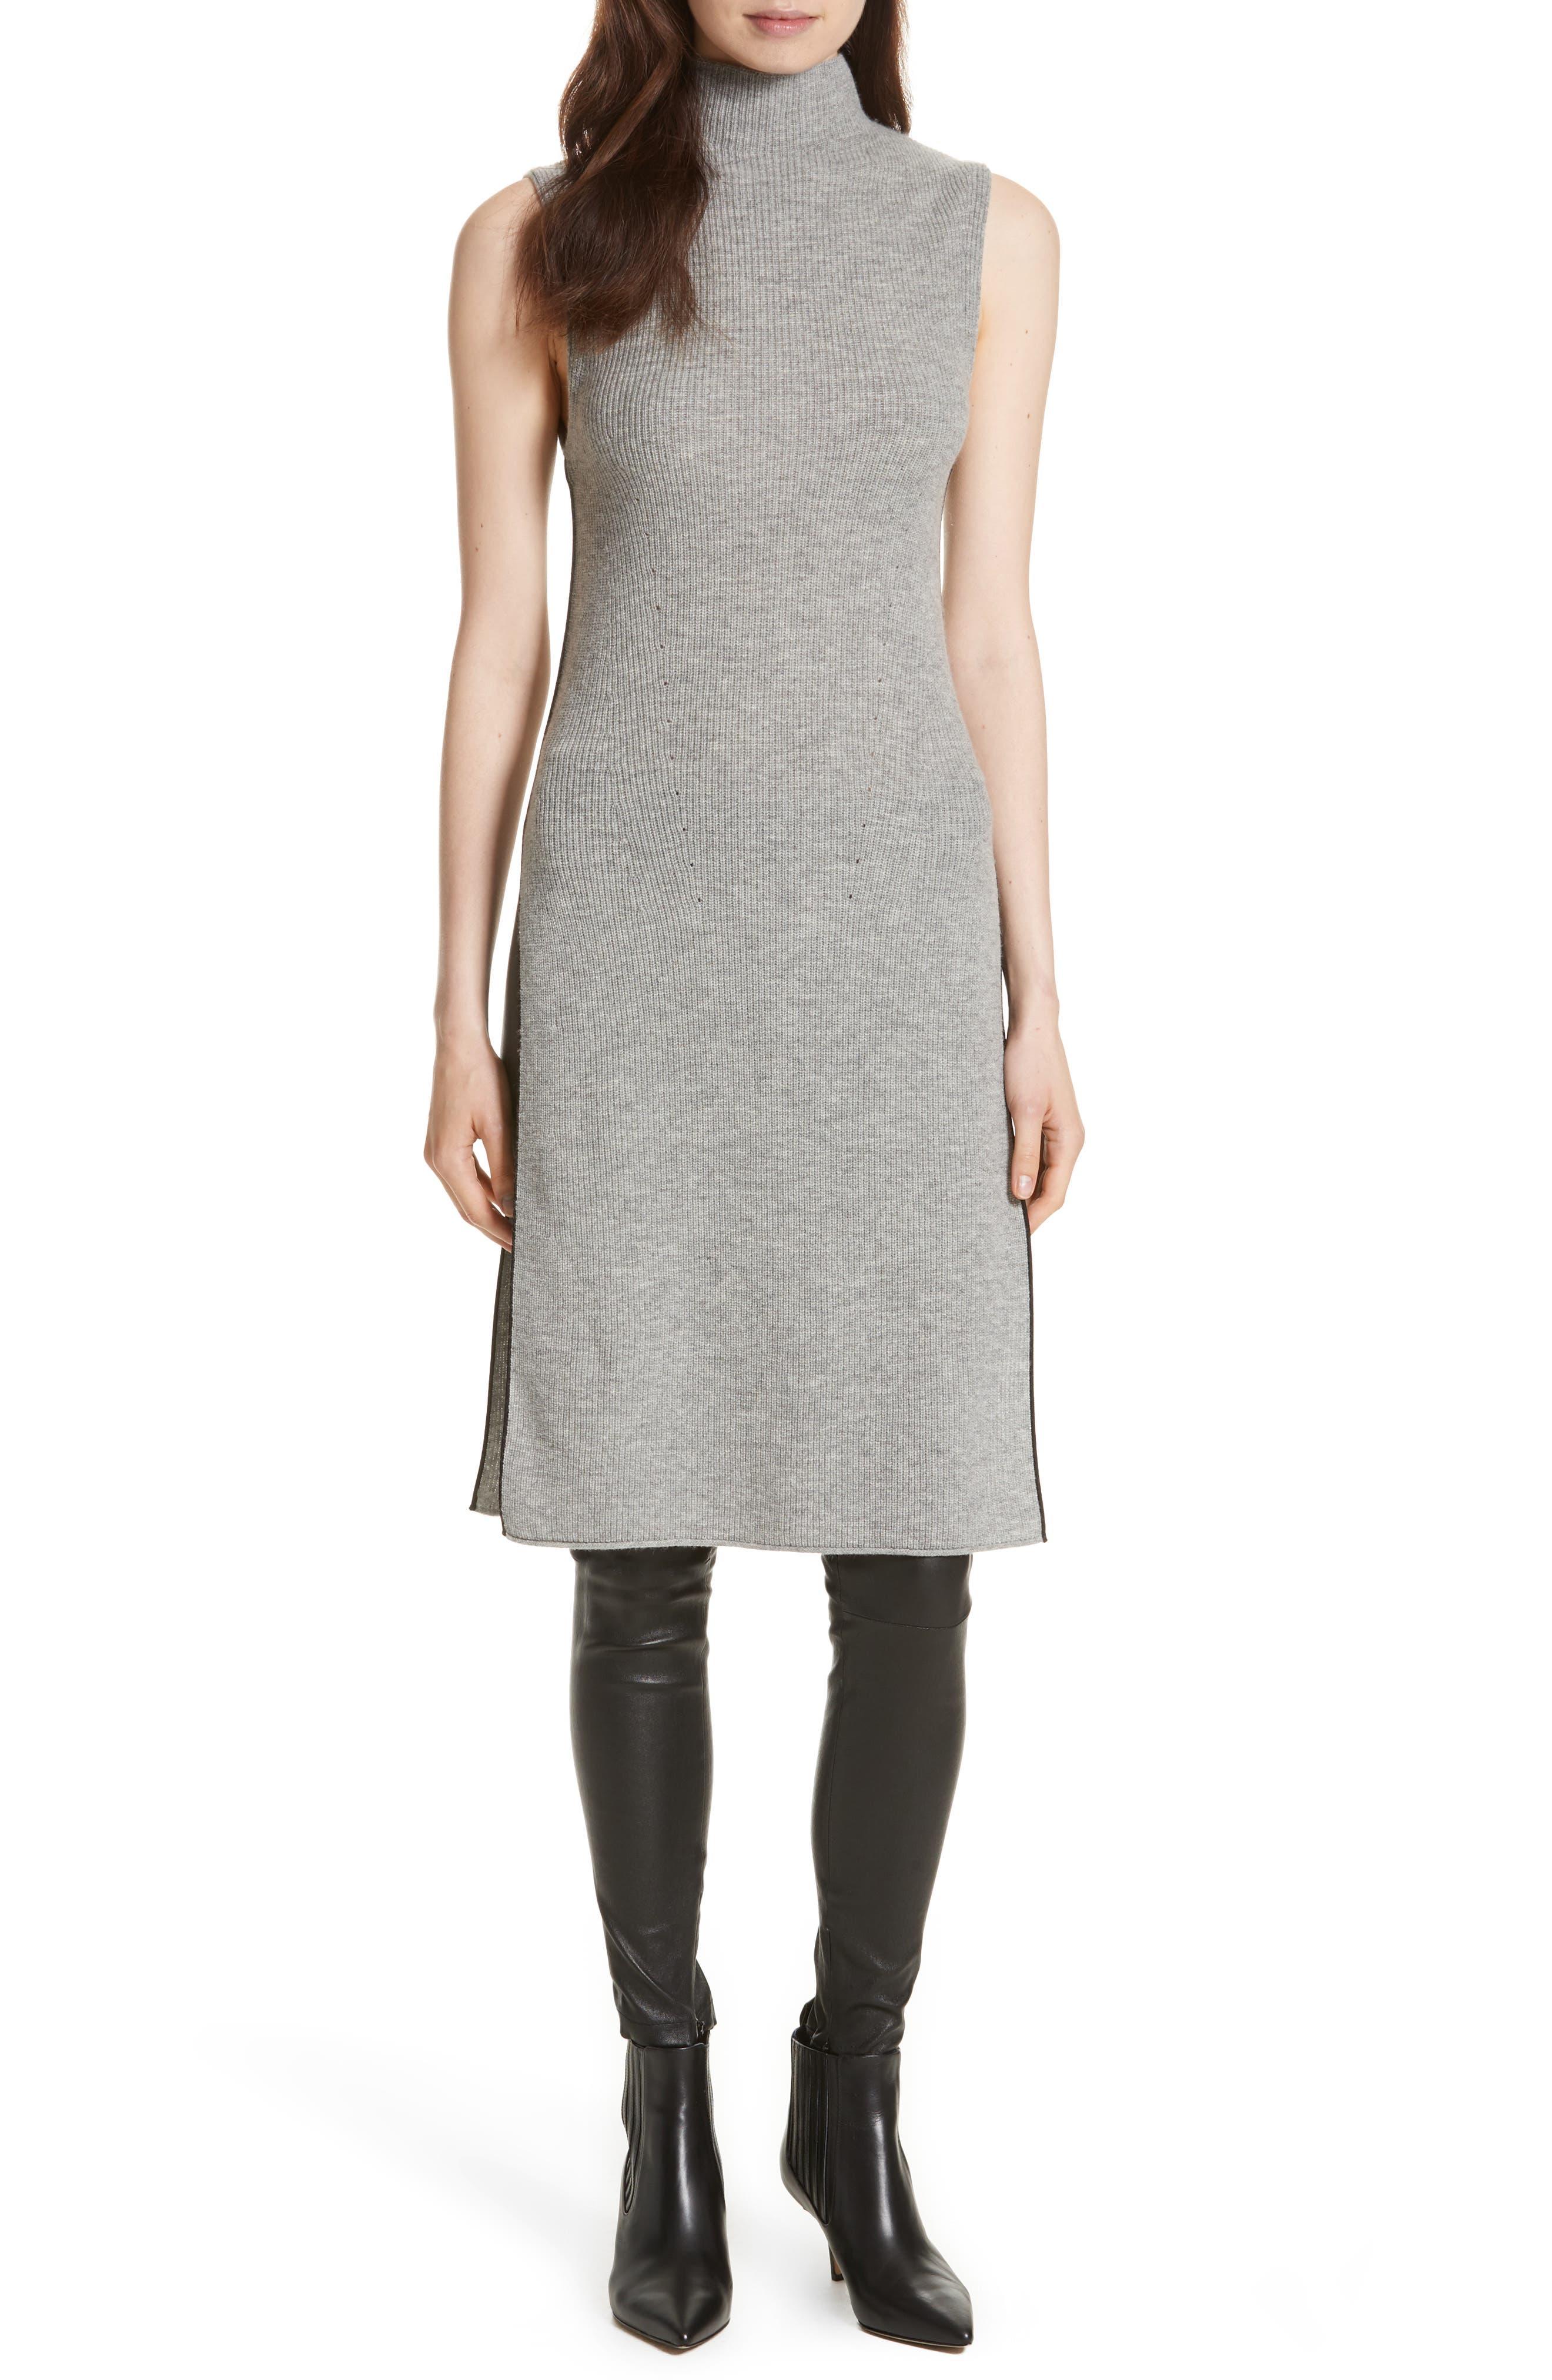 Alternate Image 1 Selected - Alice + Olivia Stori Double Slit Sweater Dress